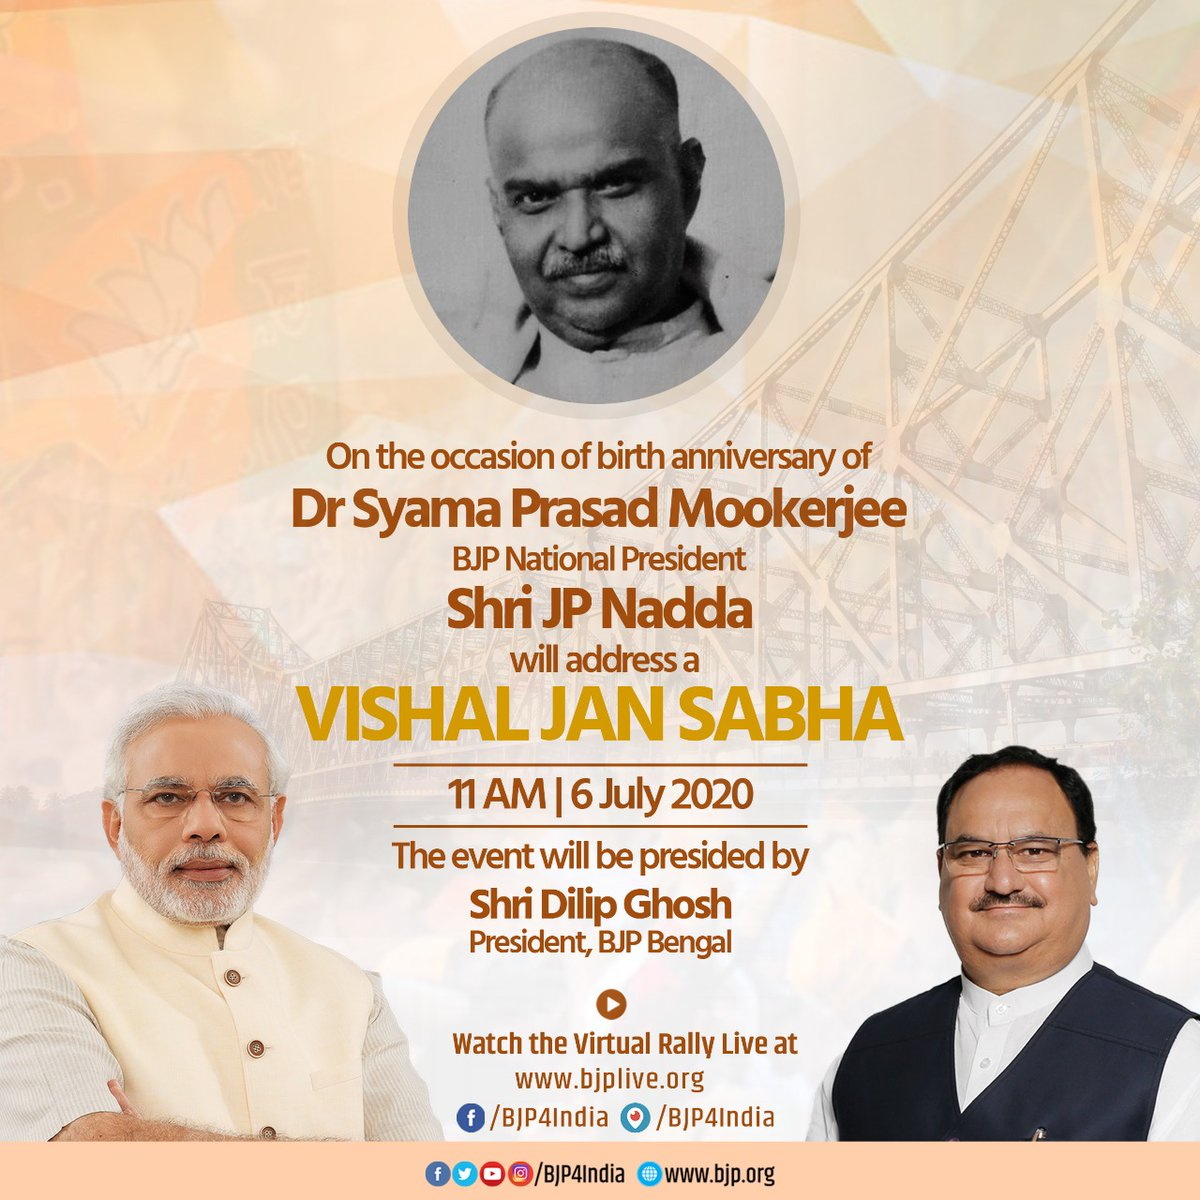 BJP National President Shri @JPNadda will address a 'Vishal Jan Sabha' on the occasion of birth anniversary of Dr Syama Prasad Mookerjee on 6th July 2020.  Watch on  https://t.co/vpP0MI6iTu https://t.co/E31Aljkes3 https://t.co/lcXkSnweeN https://t.co/jtwD1yPhm4 https://t.co/oq9hXTS9Ab